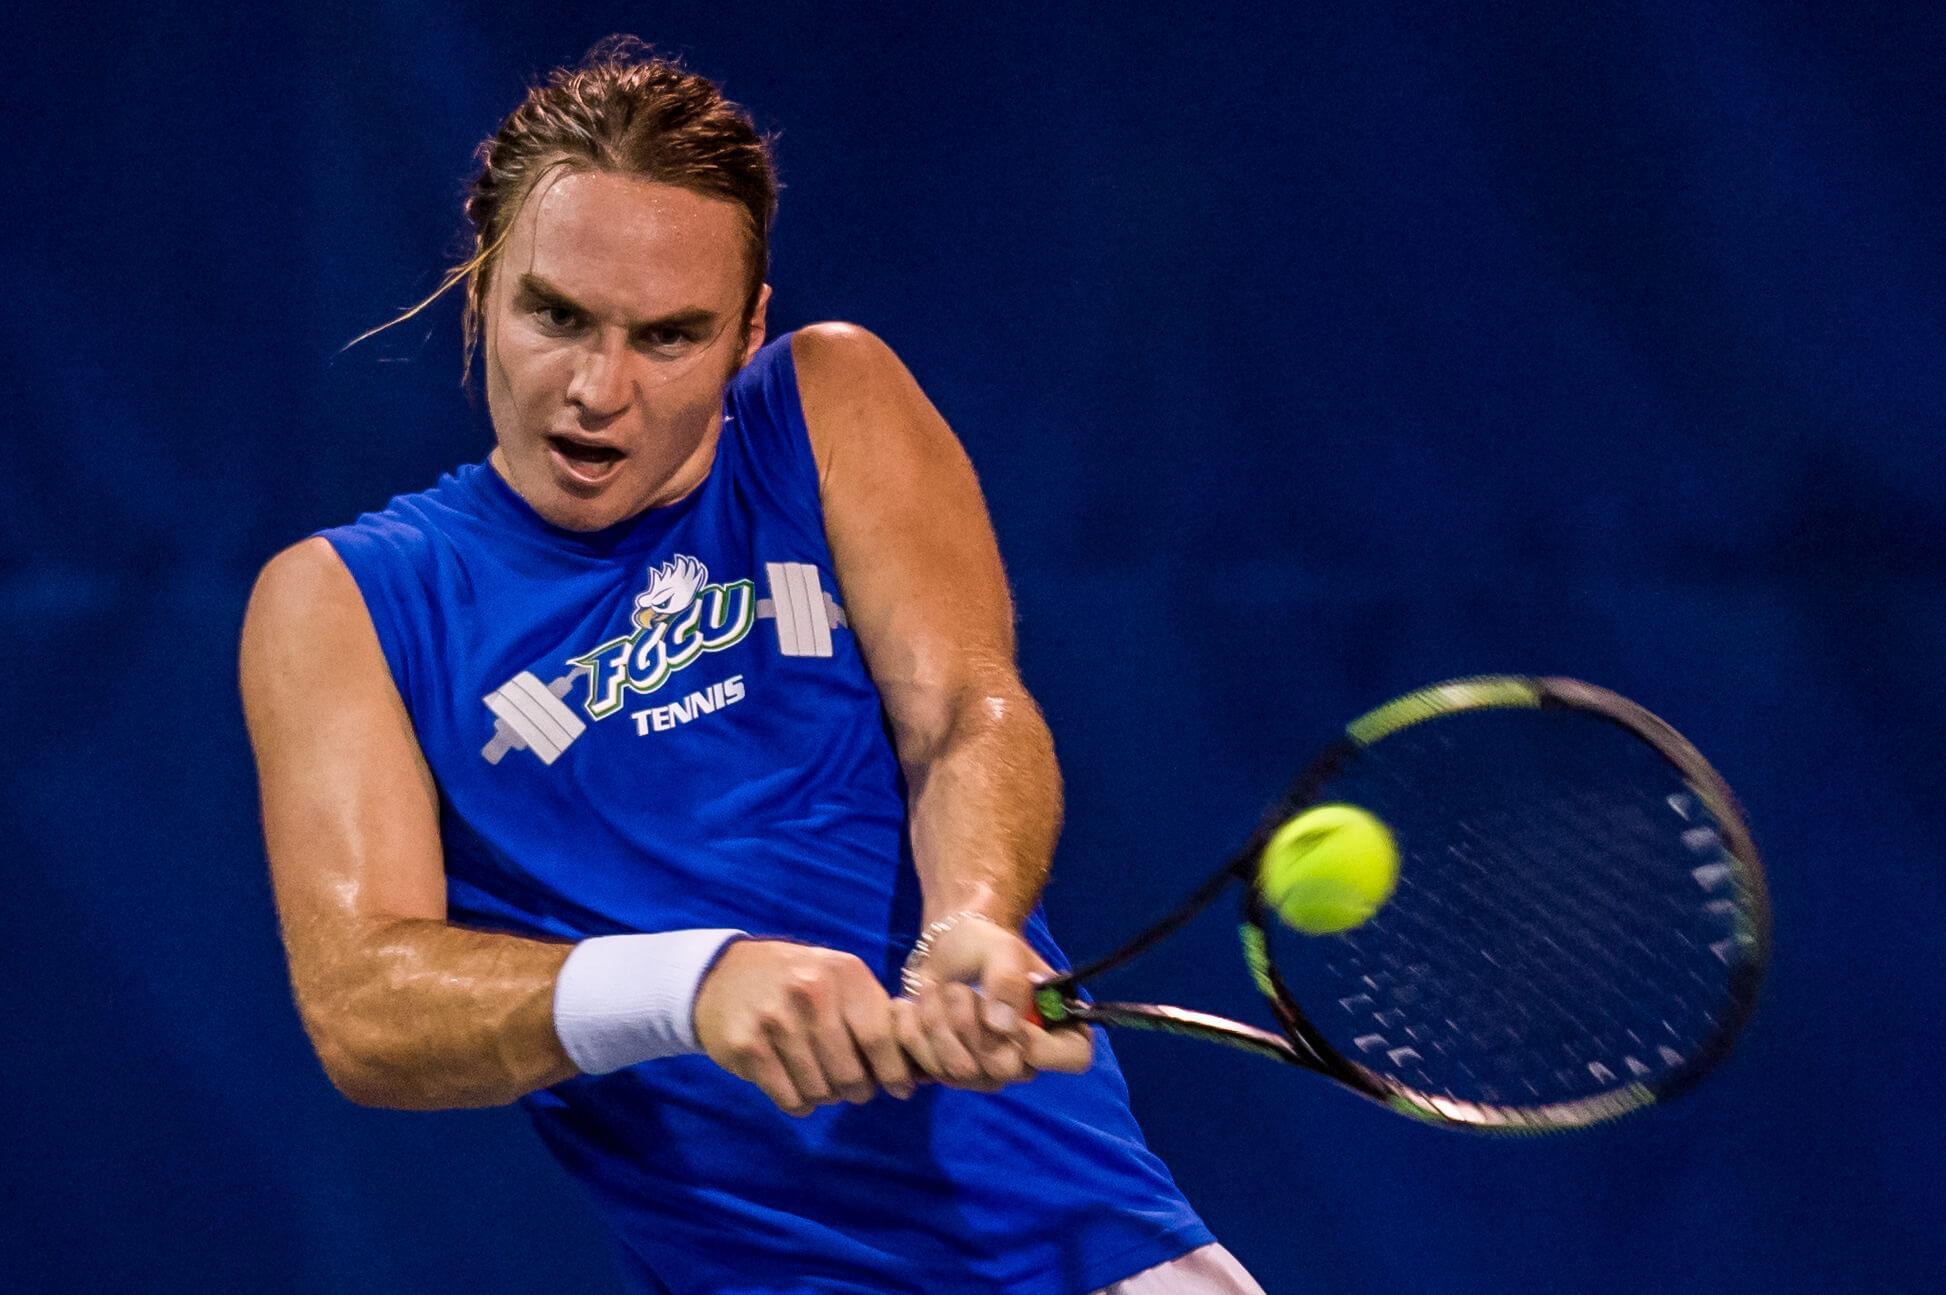 FGCU men's tennis splits in Statesboro